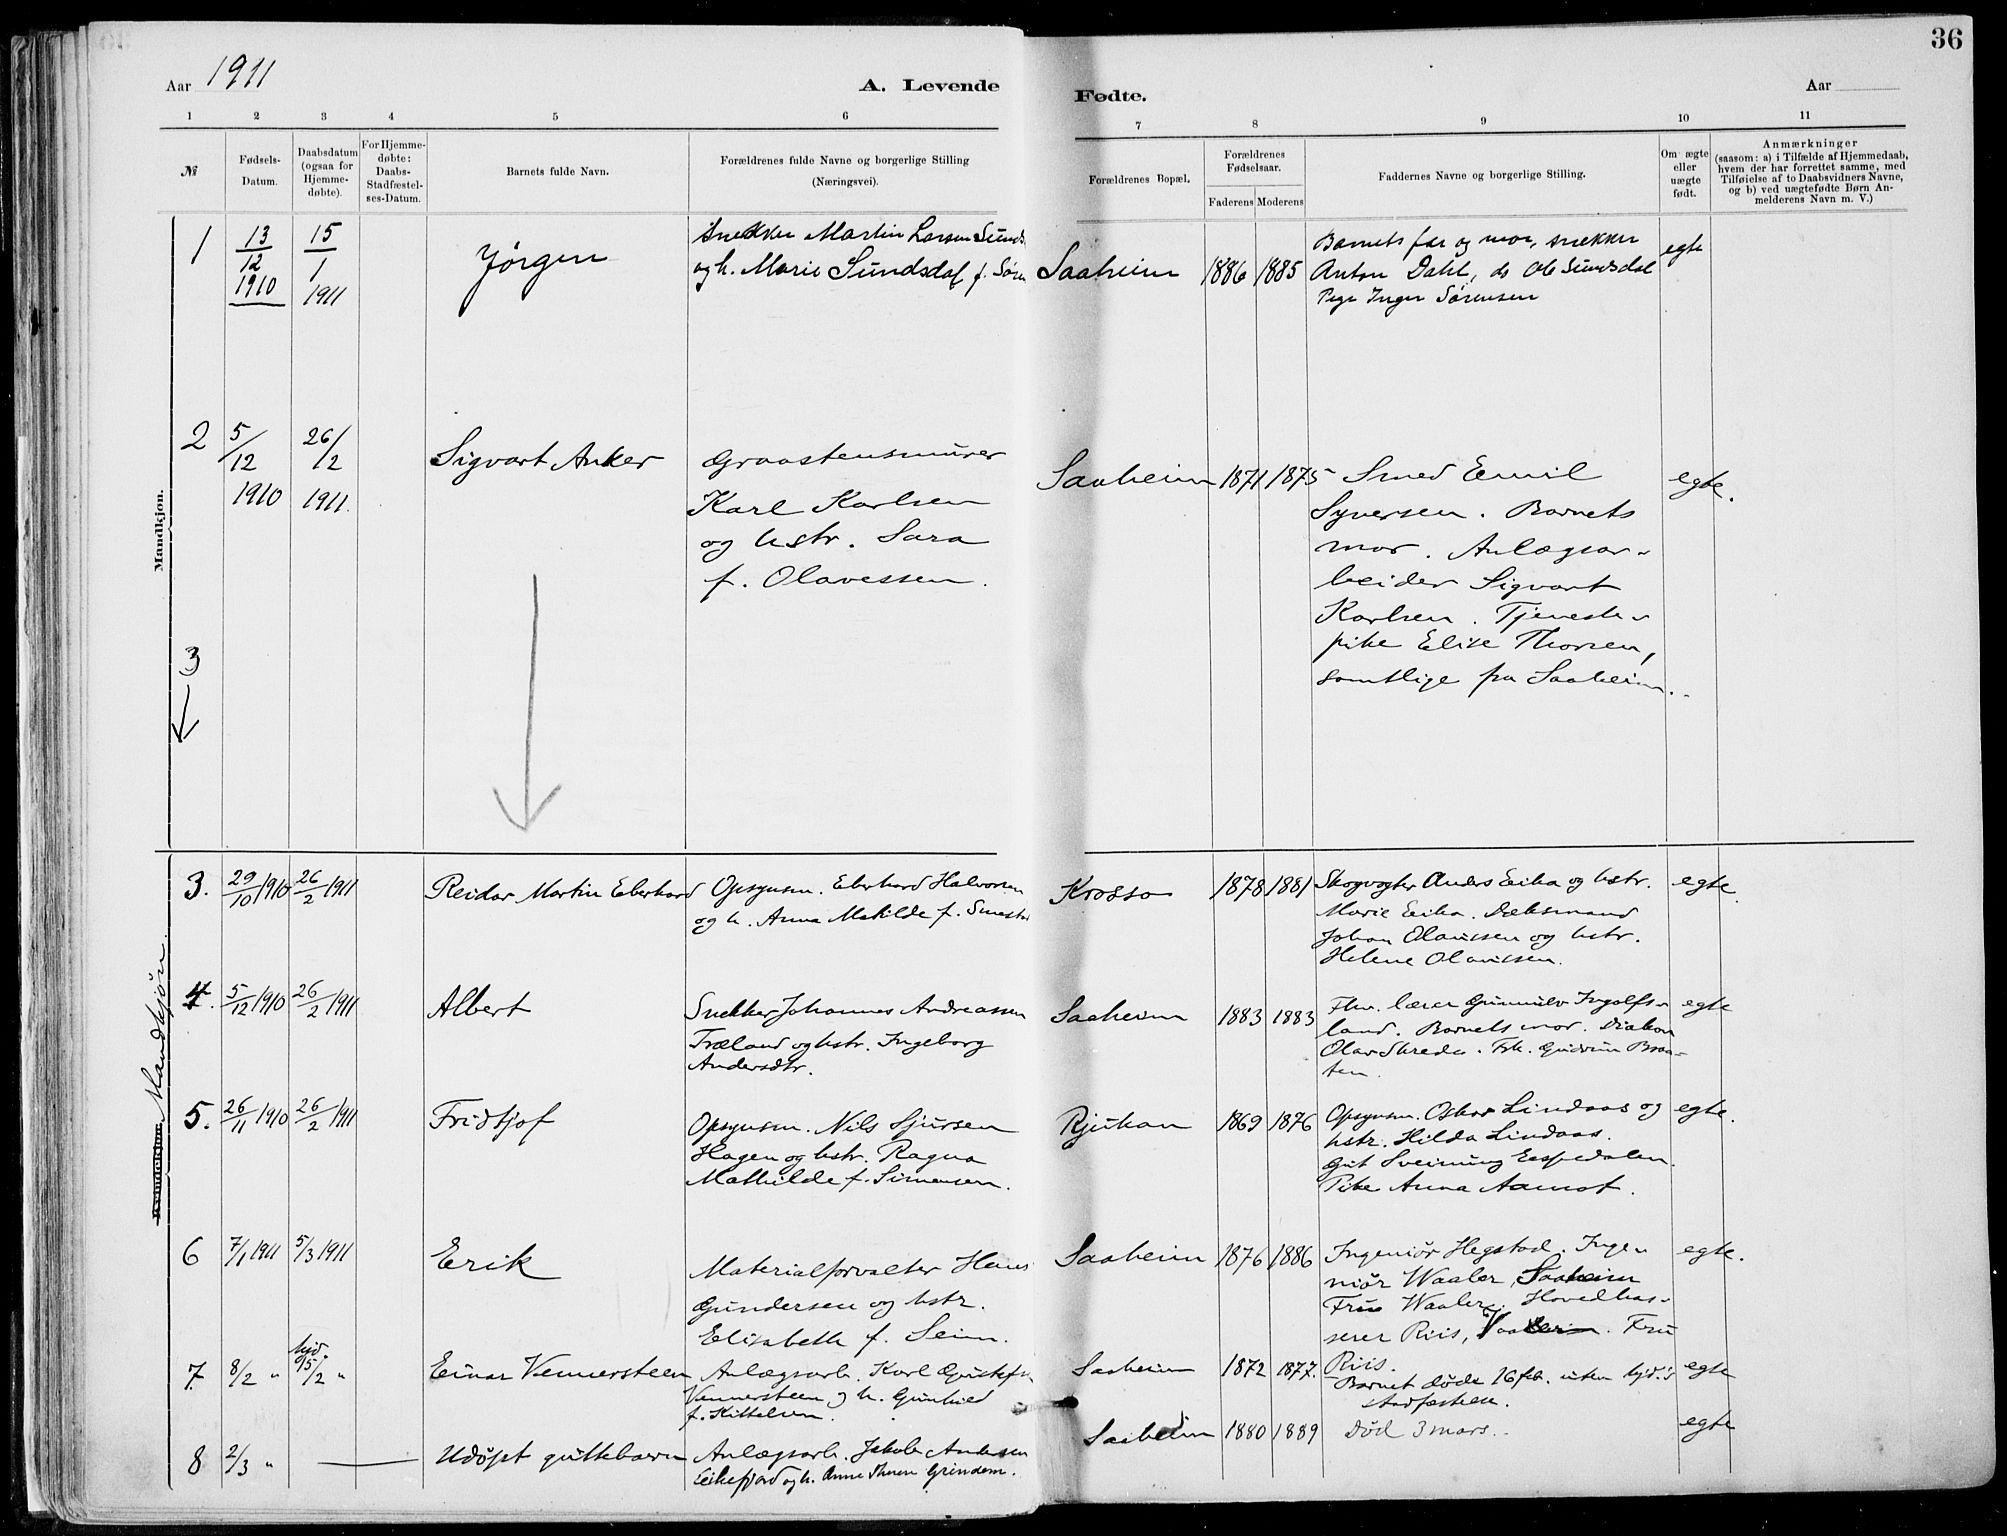 SAKO, Rjukan kirkebøker, F/Fa/L0001: Ministerialbok nr. 1, 1878-1912, s. 36